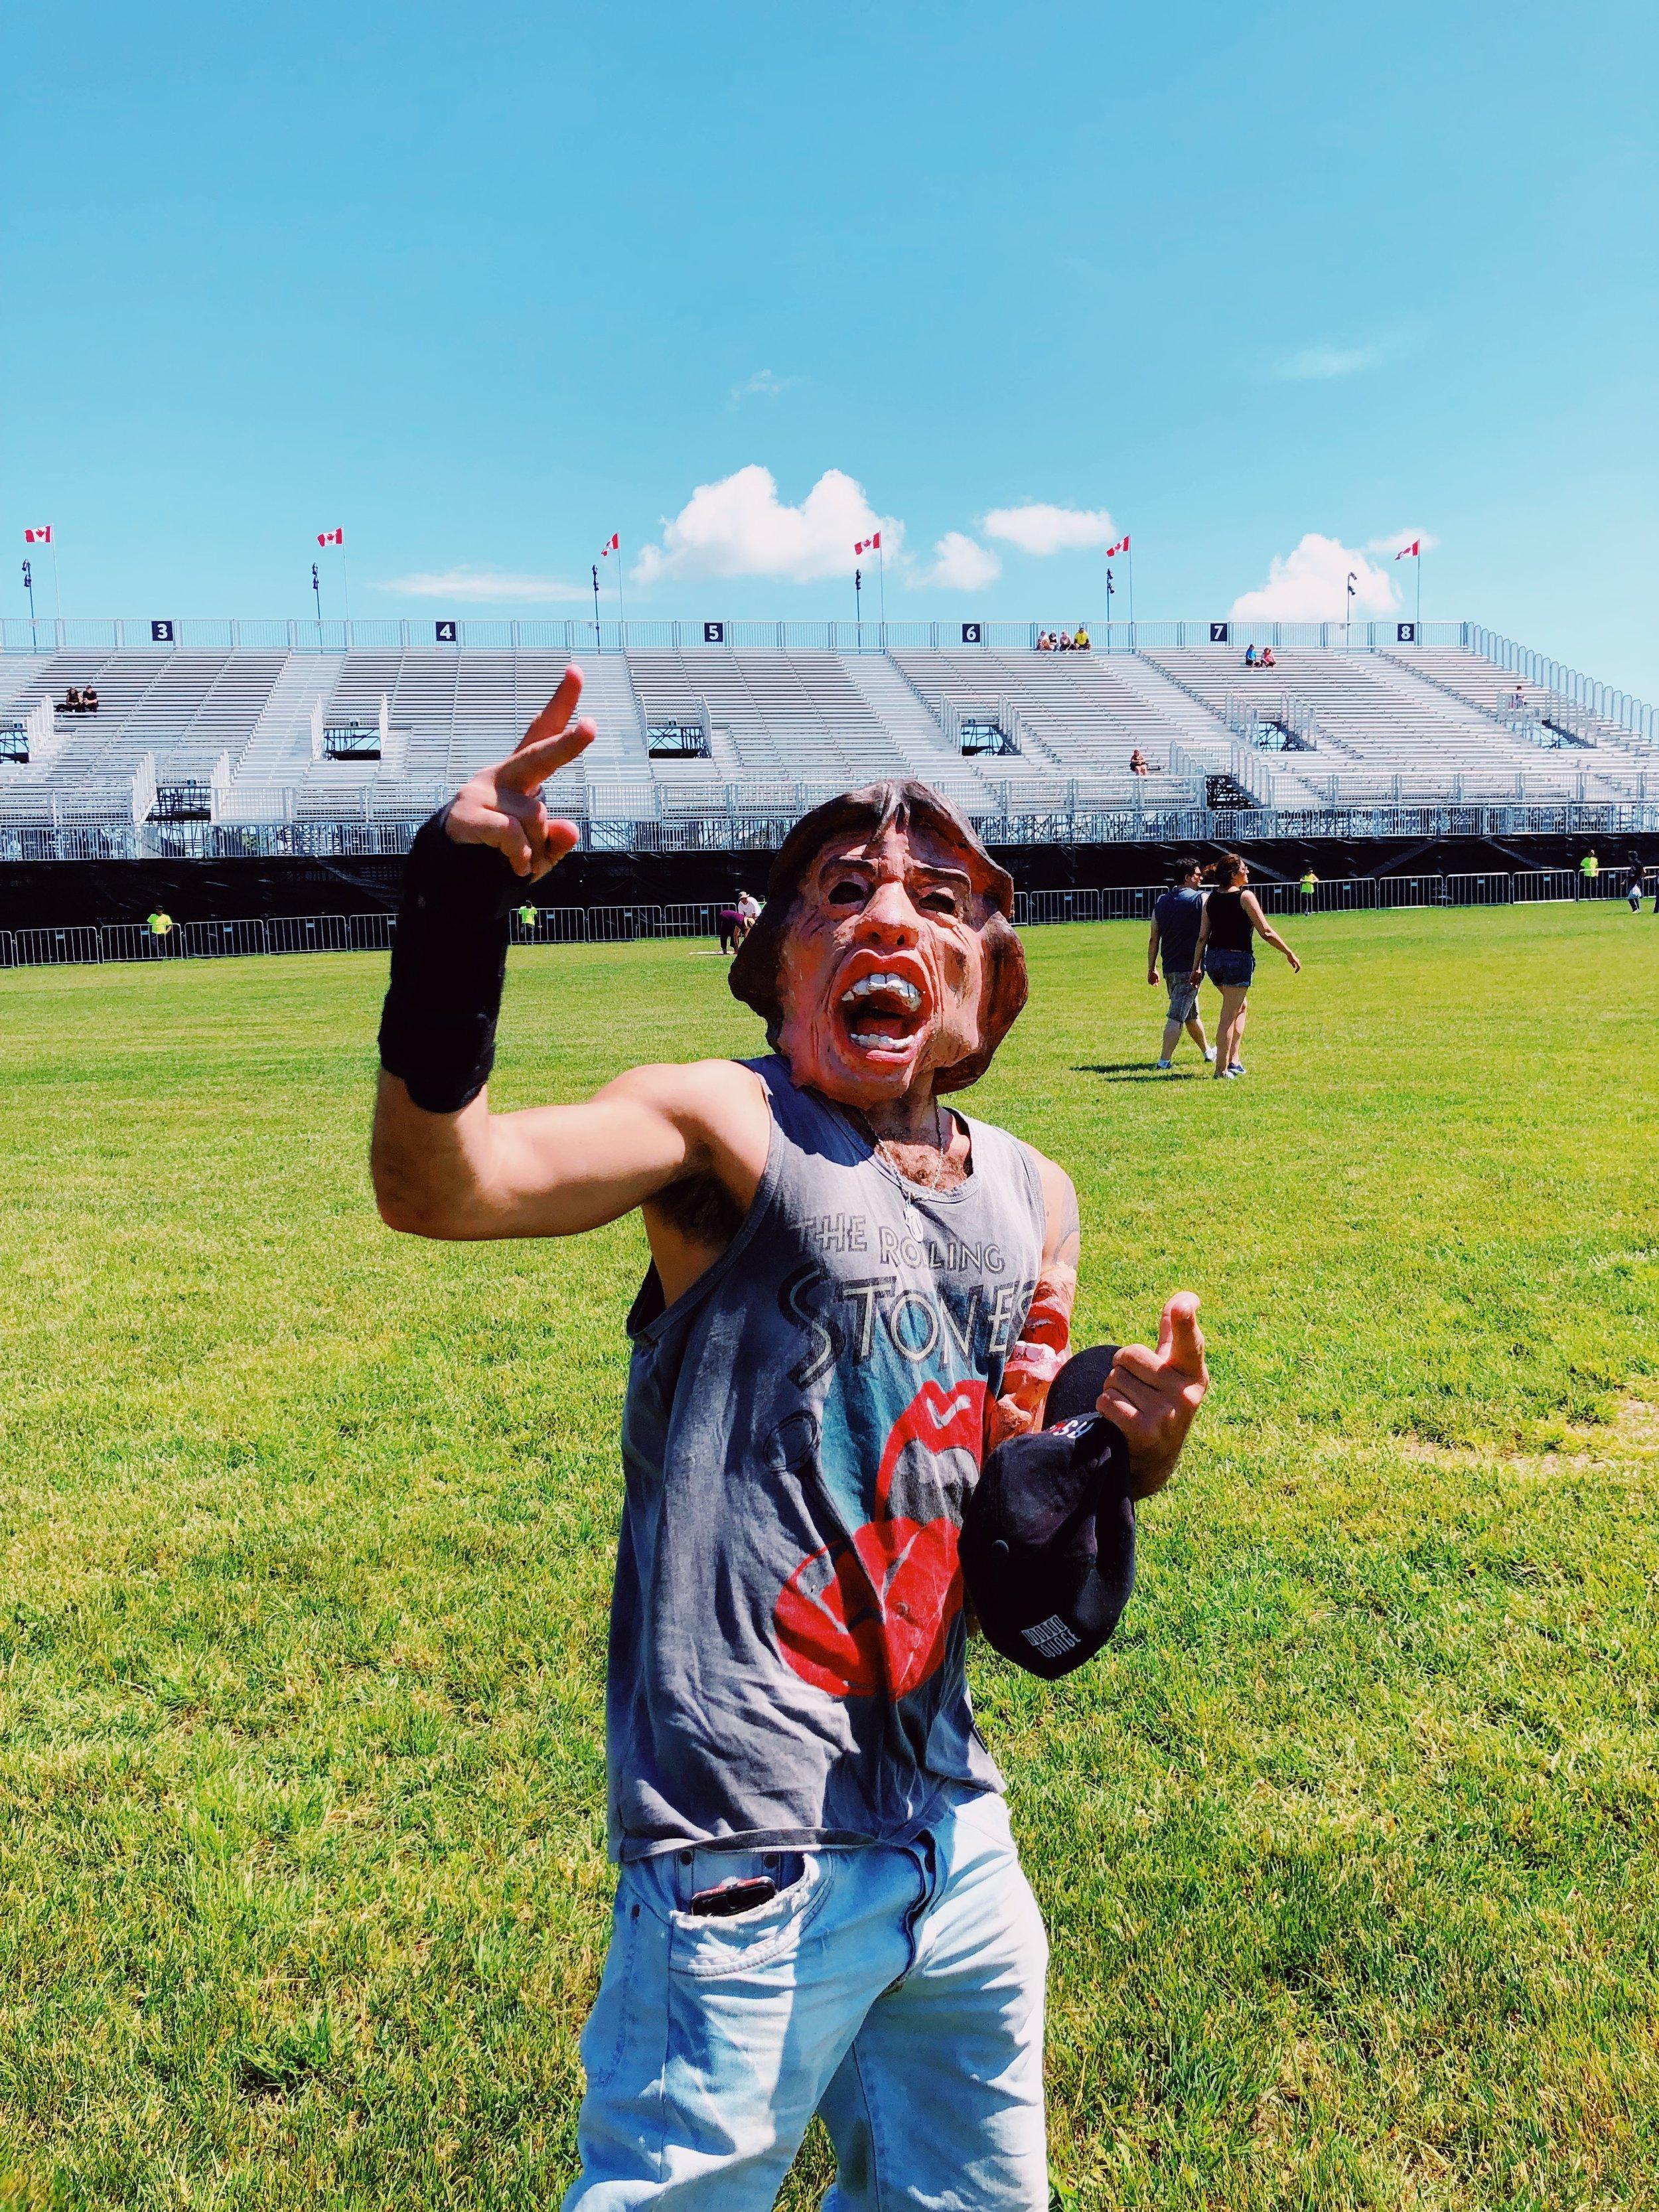 Met Mick Jagger, great guy